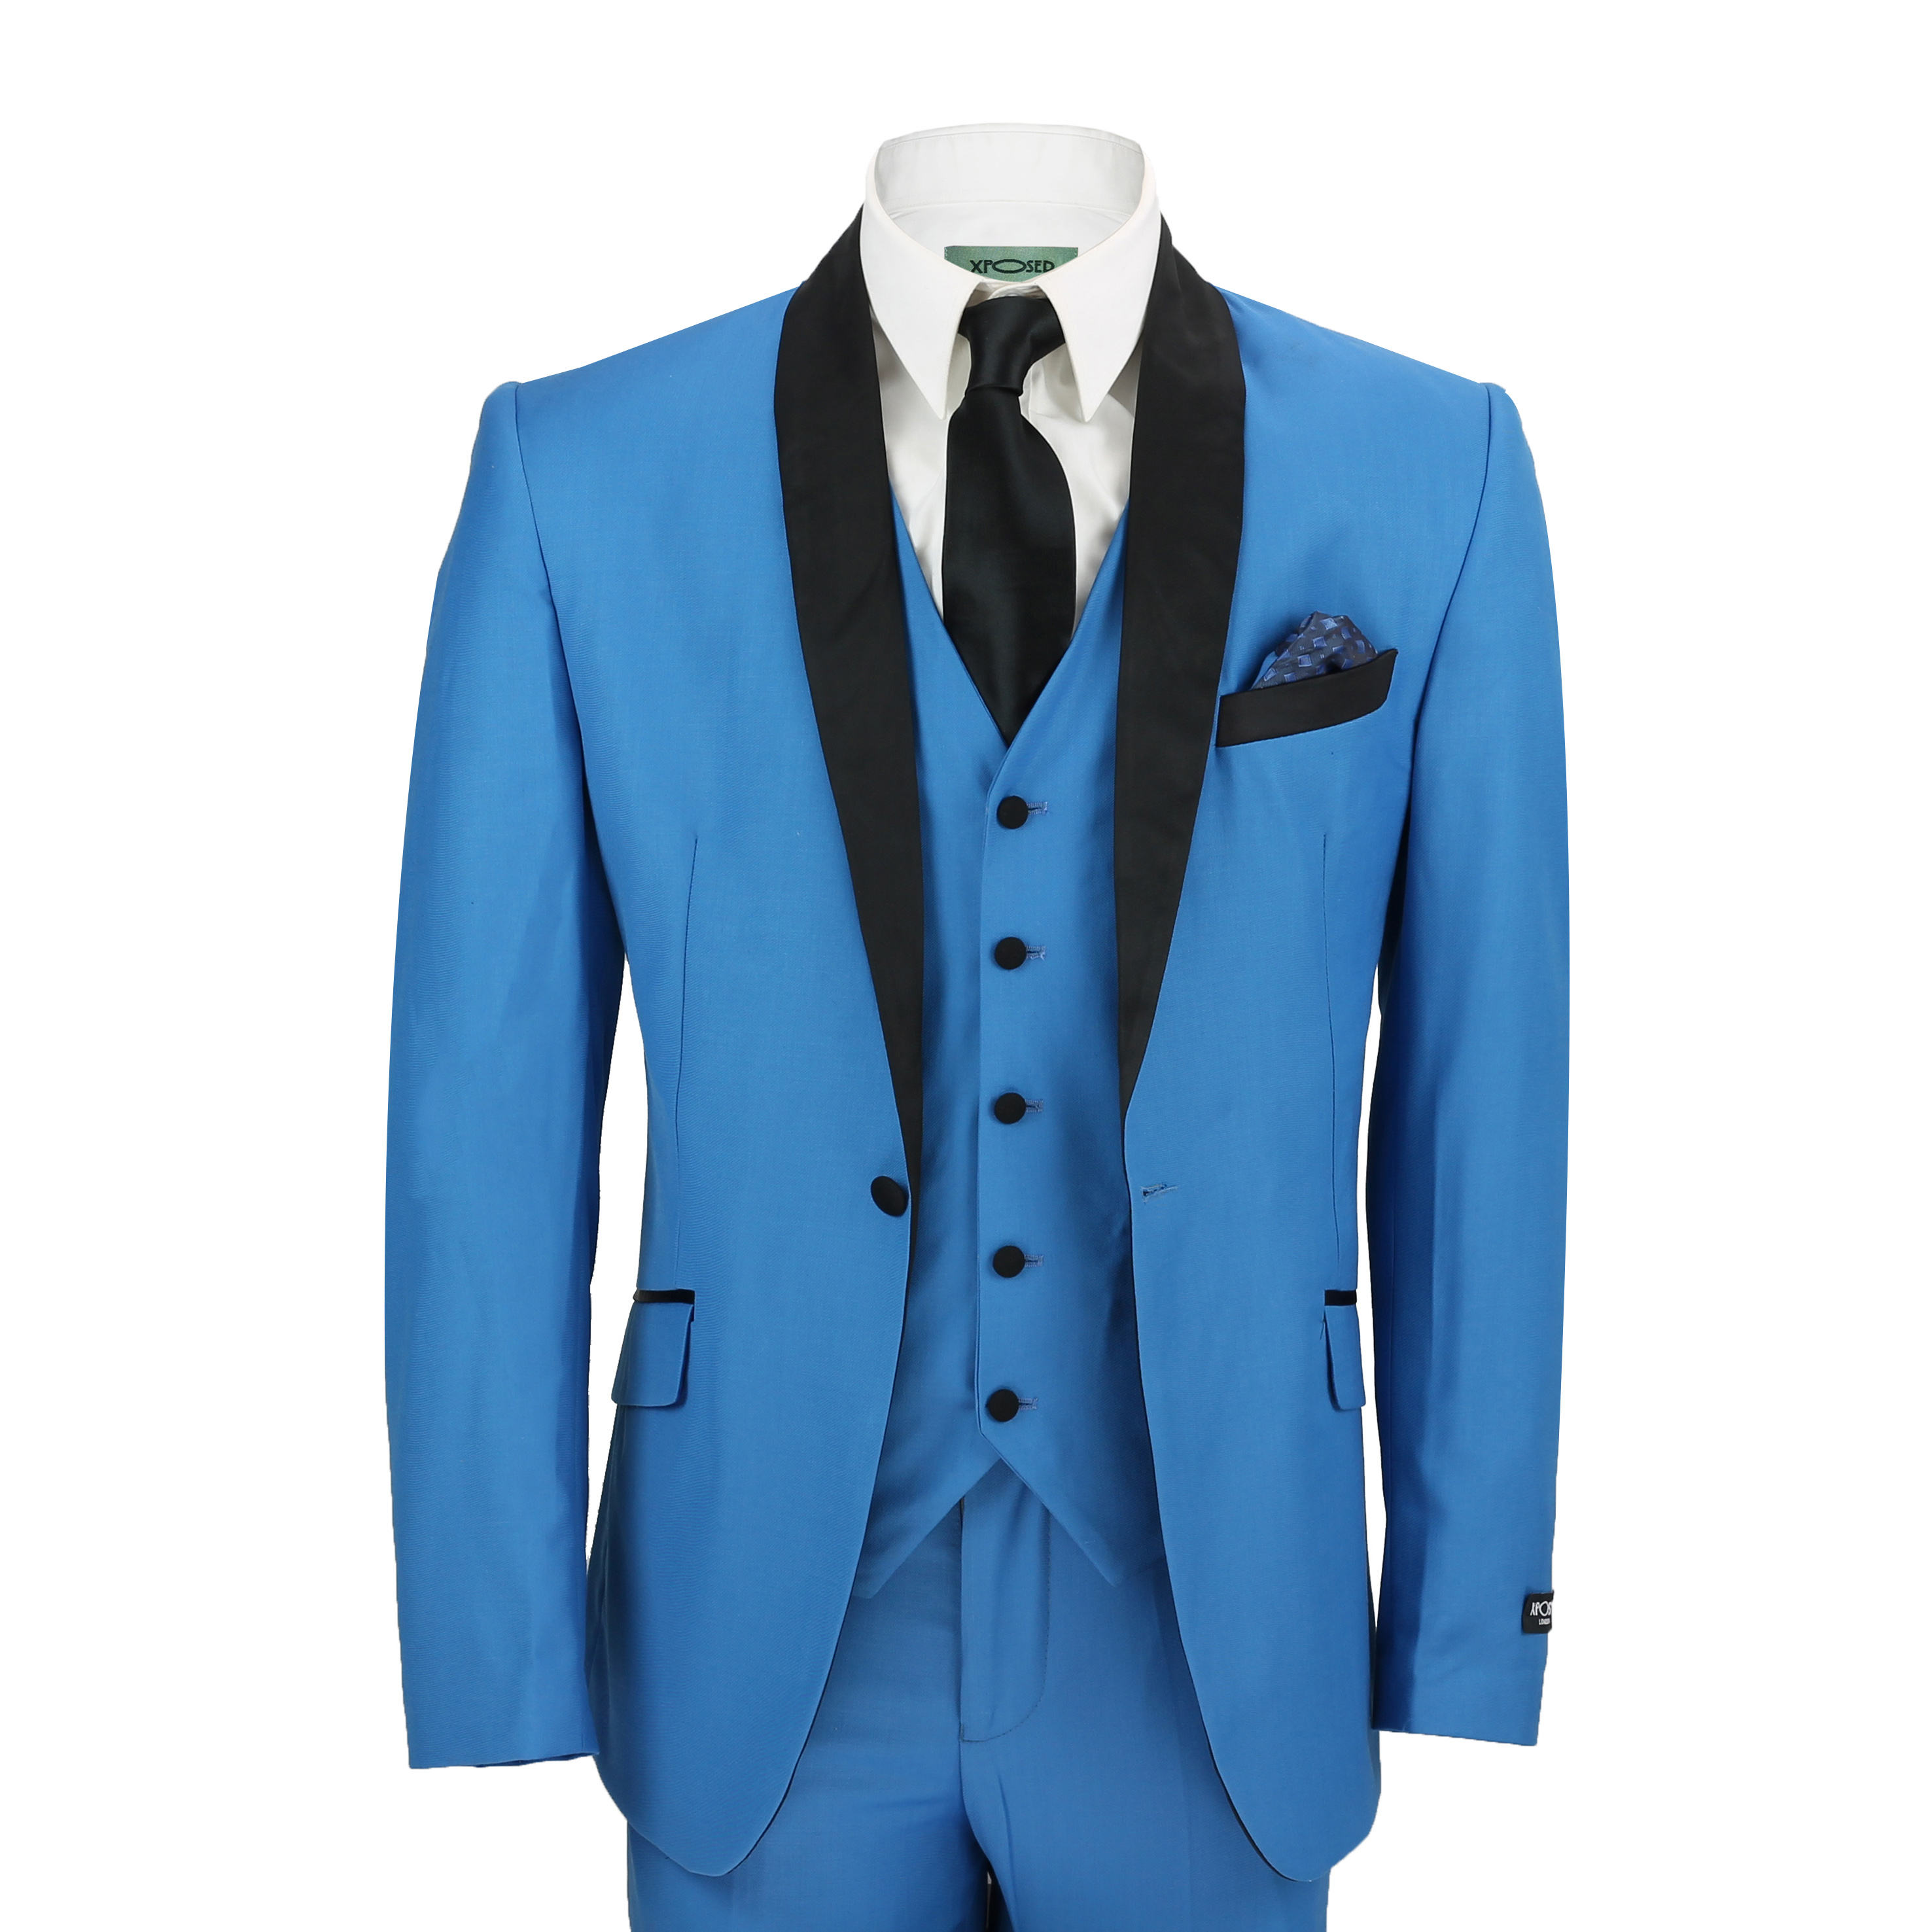 Mens 3 Piece Suit in Blue Shawl Lapels Vintage Tailored Fit Wedding ...